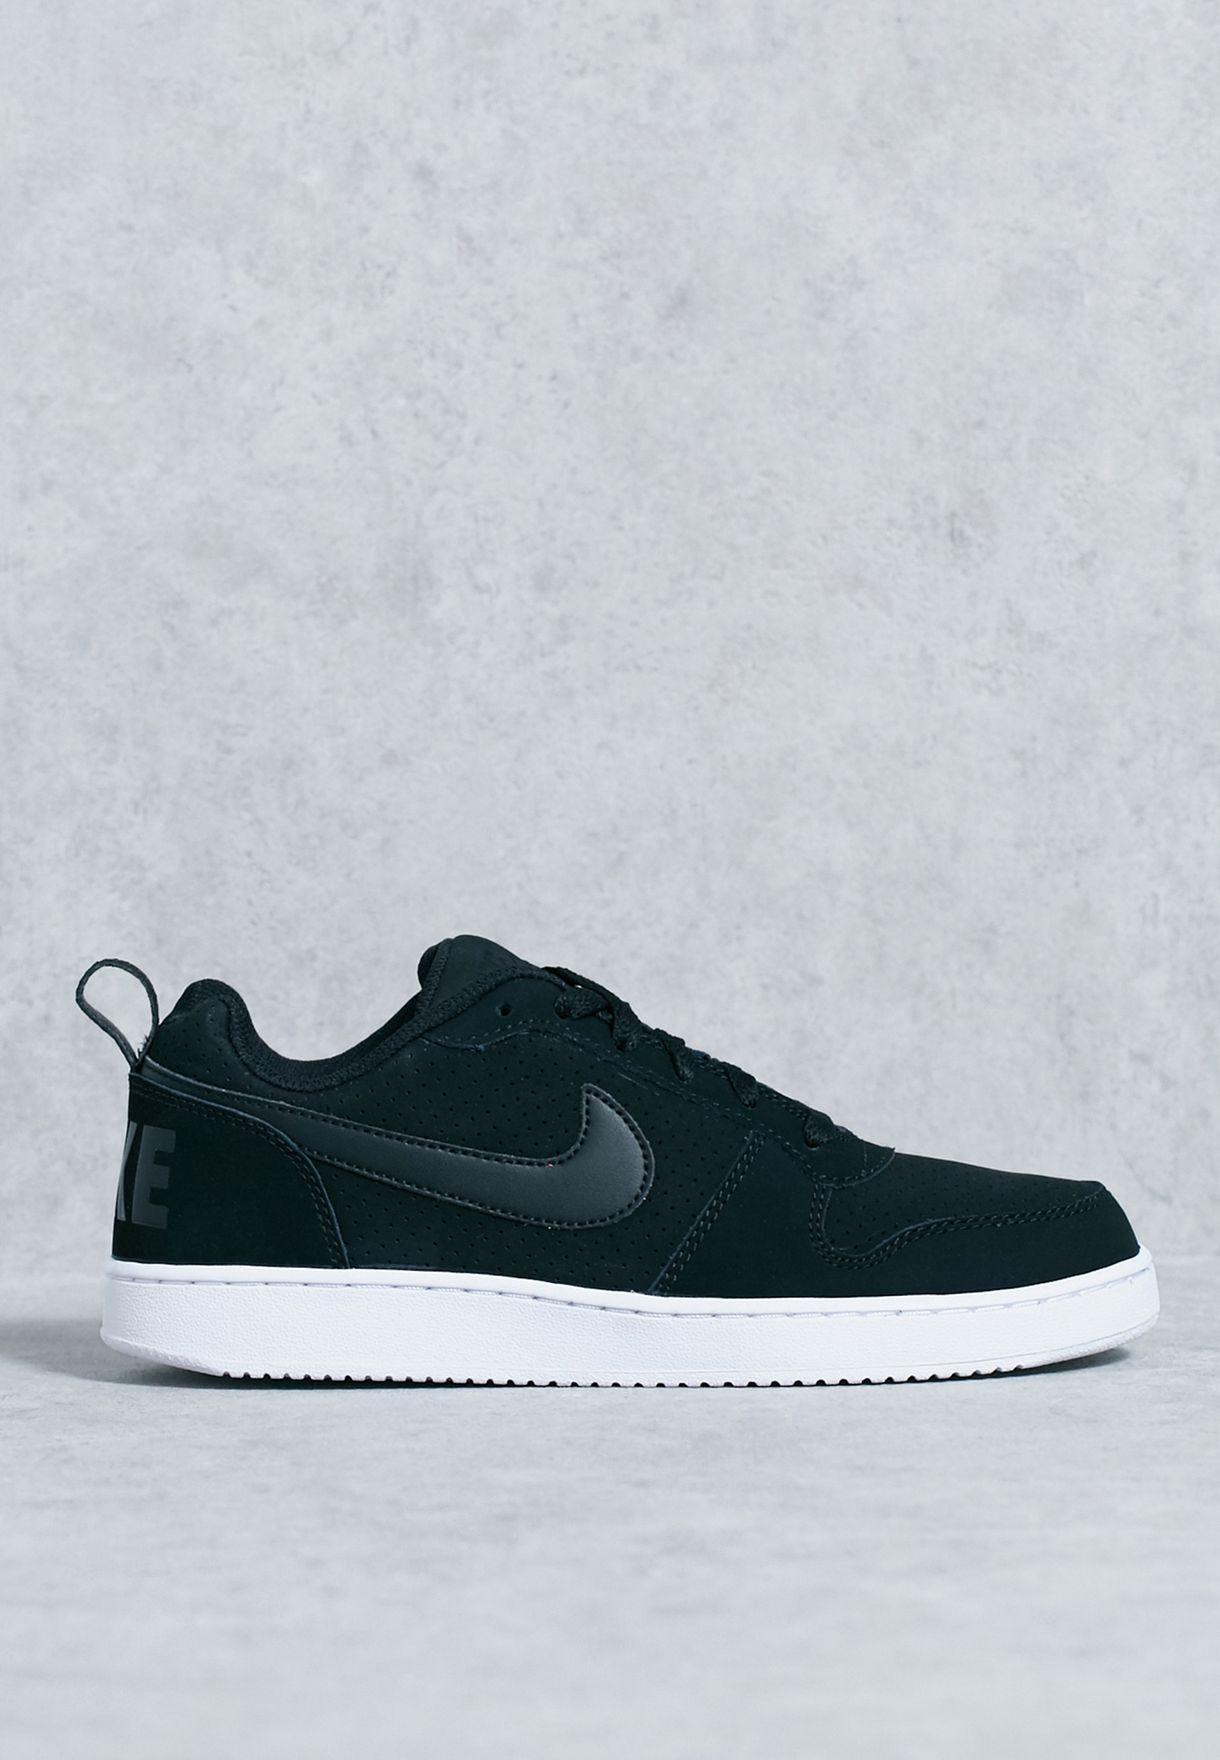 NIKE Court Borough Low Premium Sneakers WOMANS SIZE UK 8.5 EU 43 Brand New